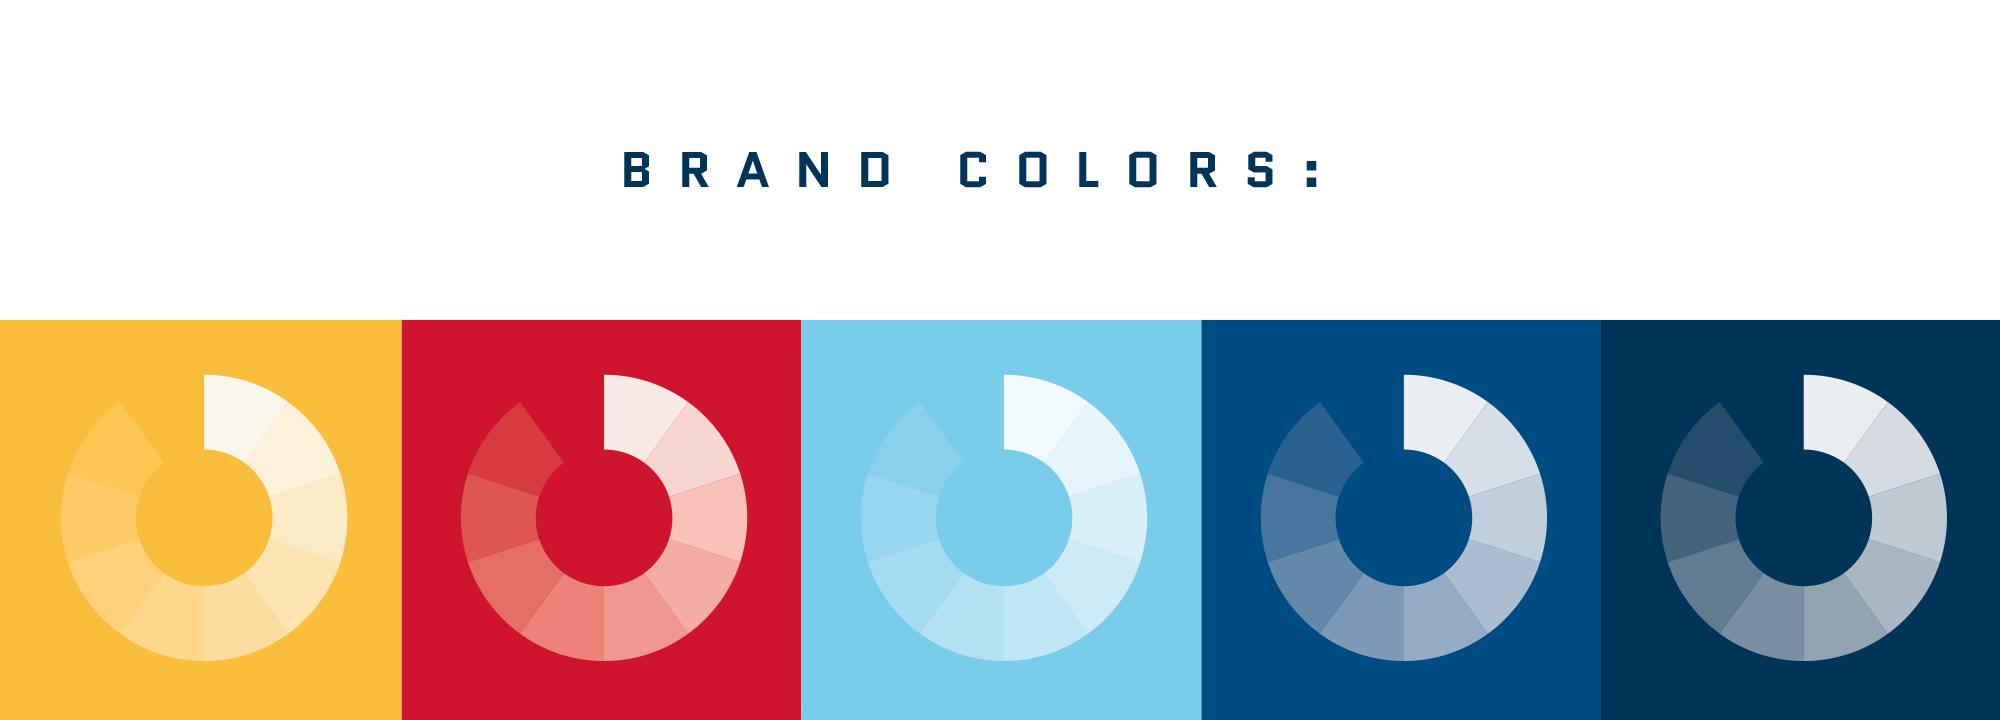 hero-brand-colors